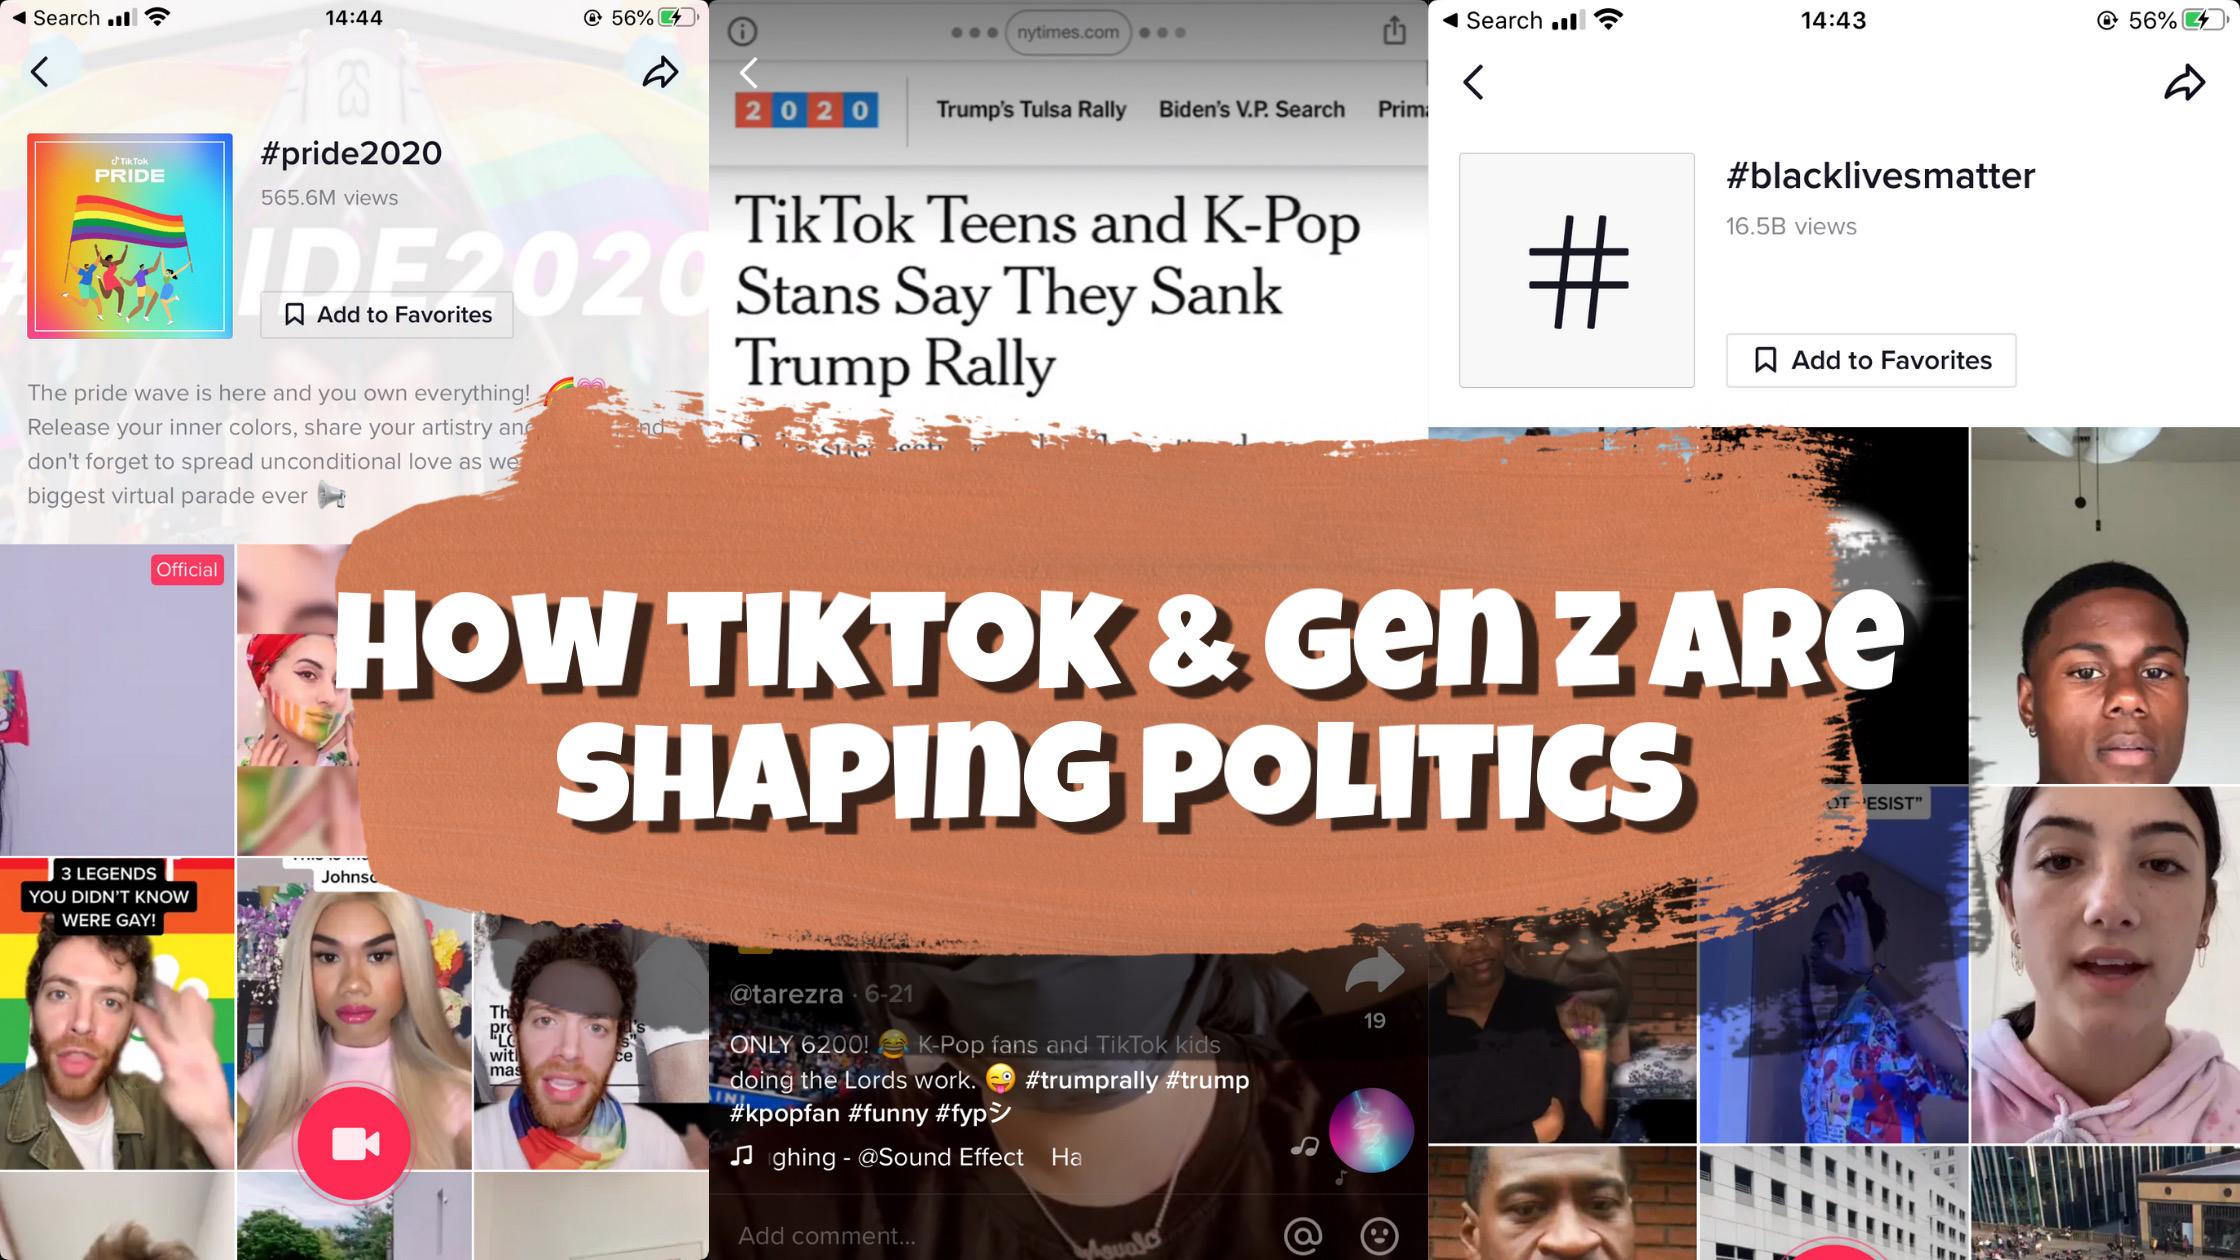 TikTok Politics & Activism: How Gen-Z and TikTok are Shaping Politics